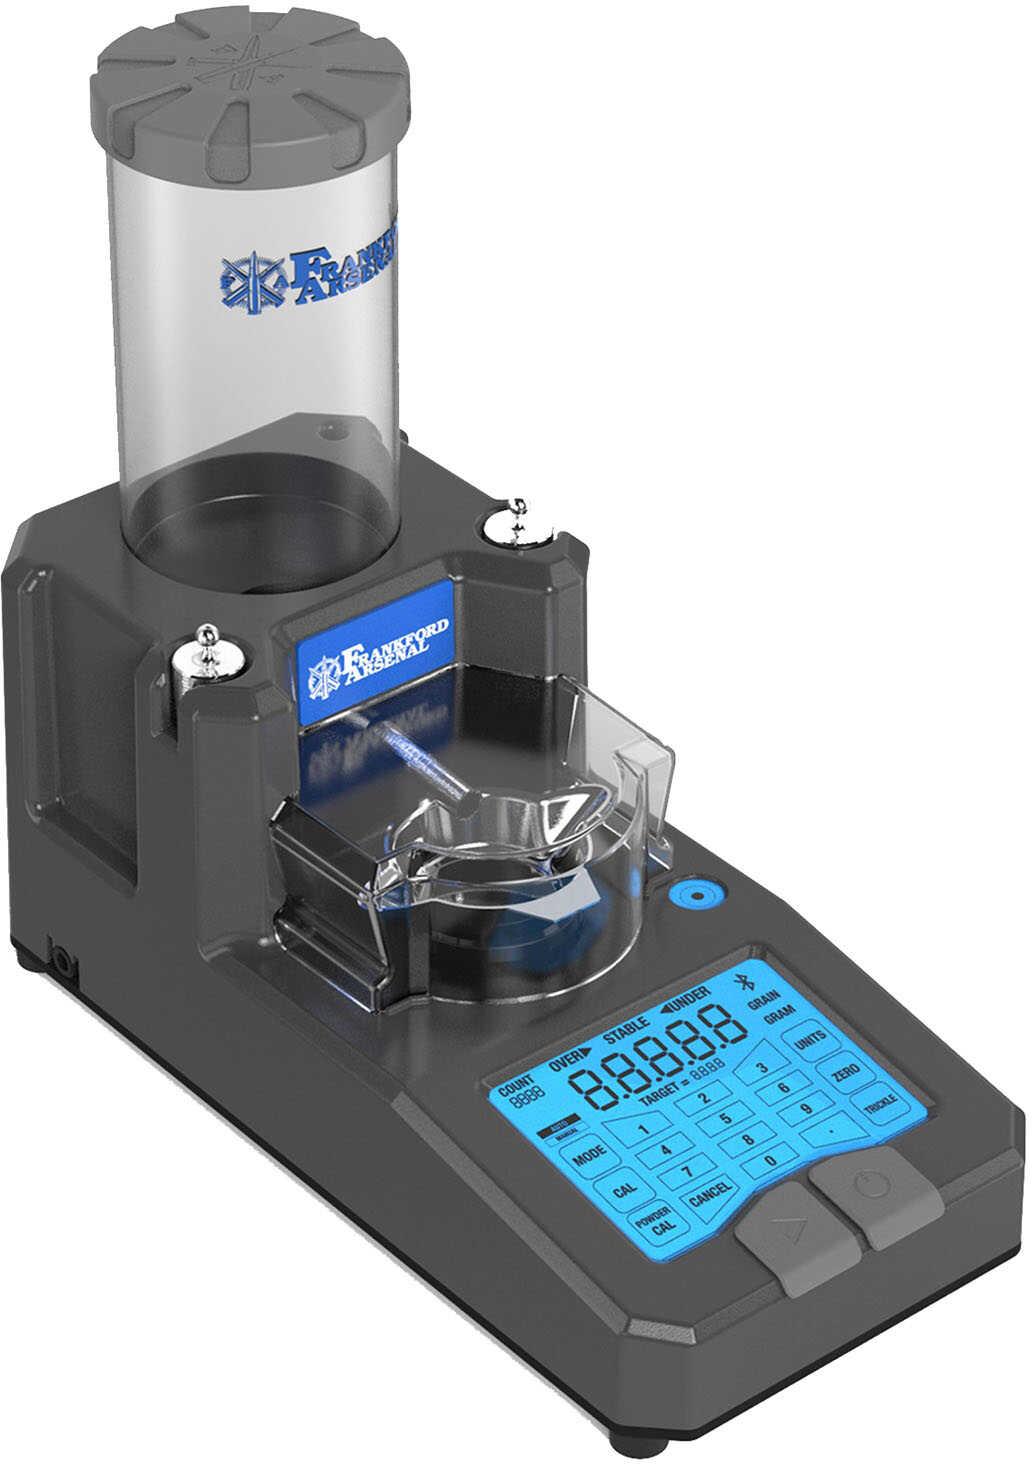 Frankford Arsenal 1082250 Platinum Intellidropper Powder Measure